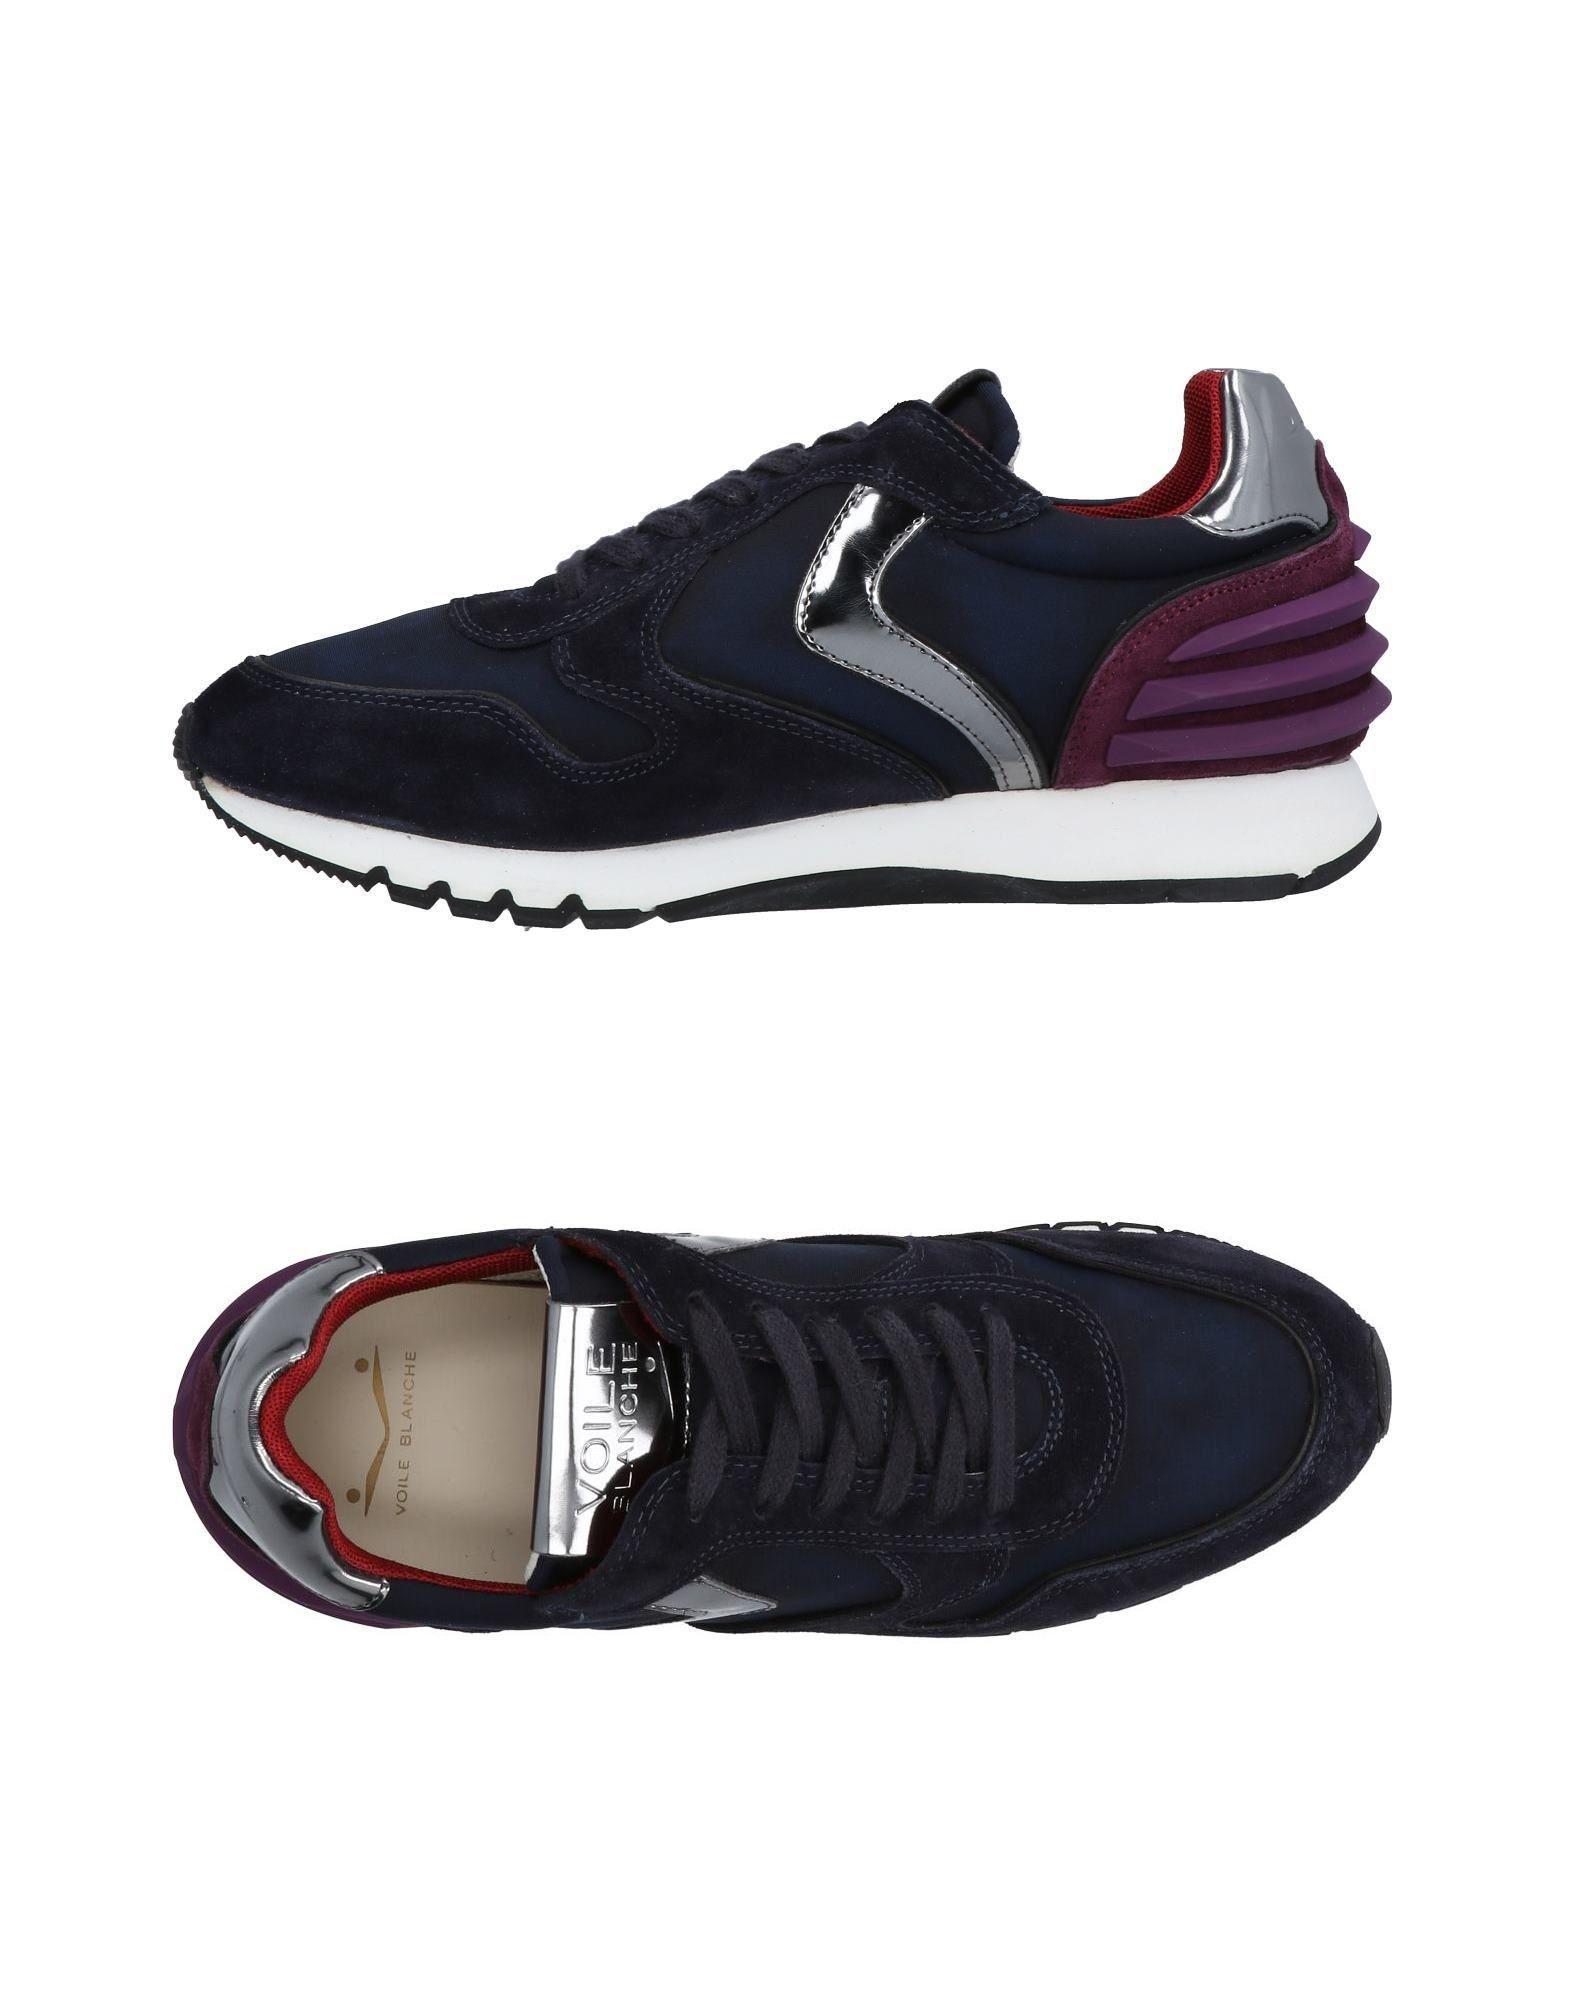 FOOTWEAR - Low-tops & sneakers Voile Blanche l6R19kf